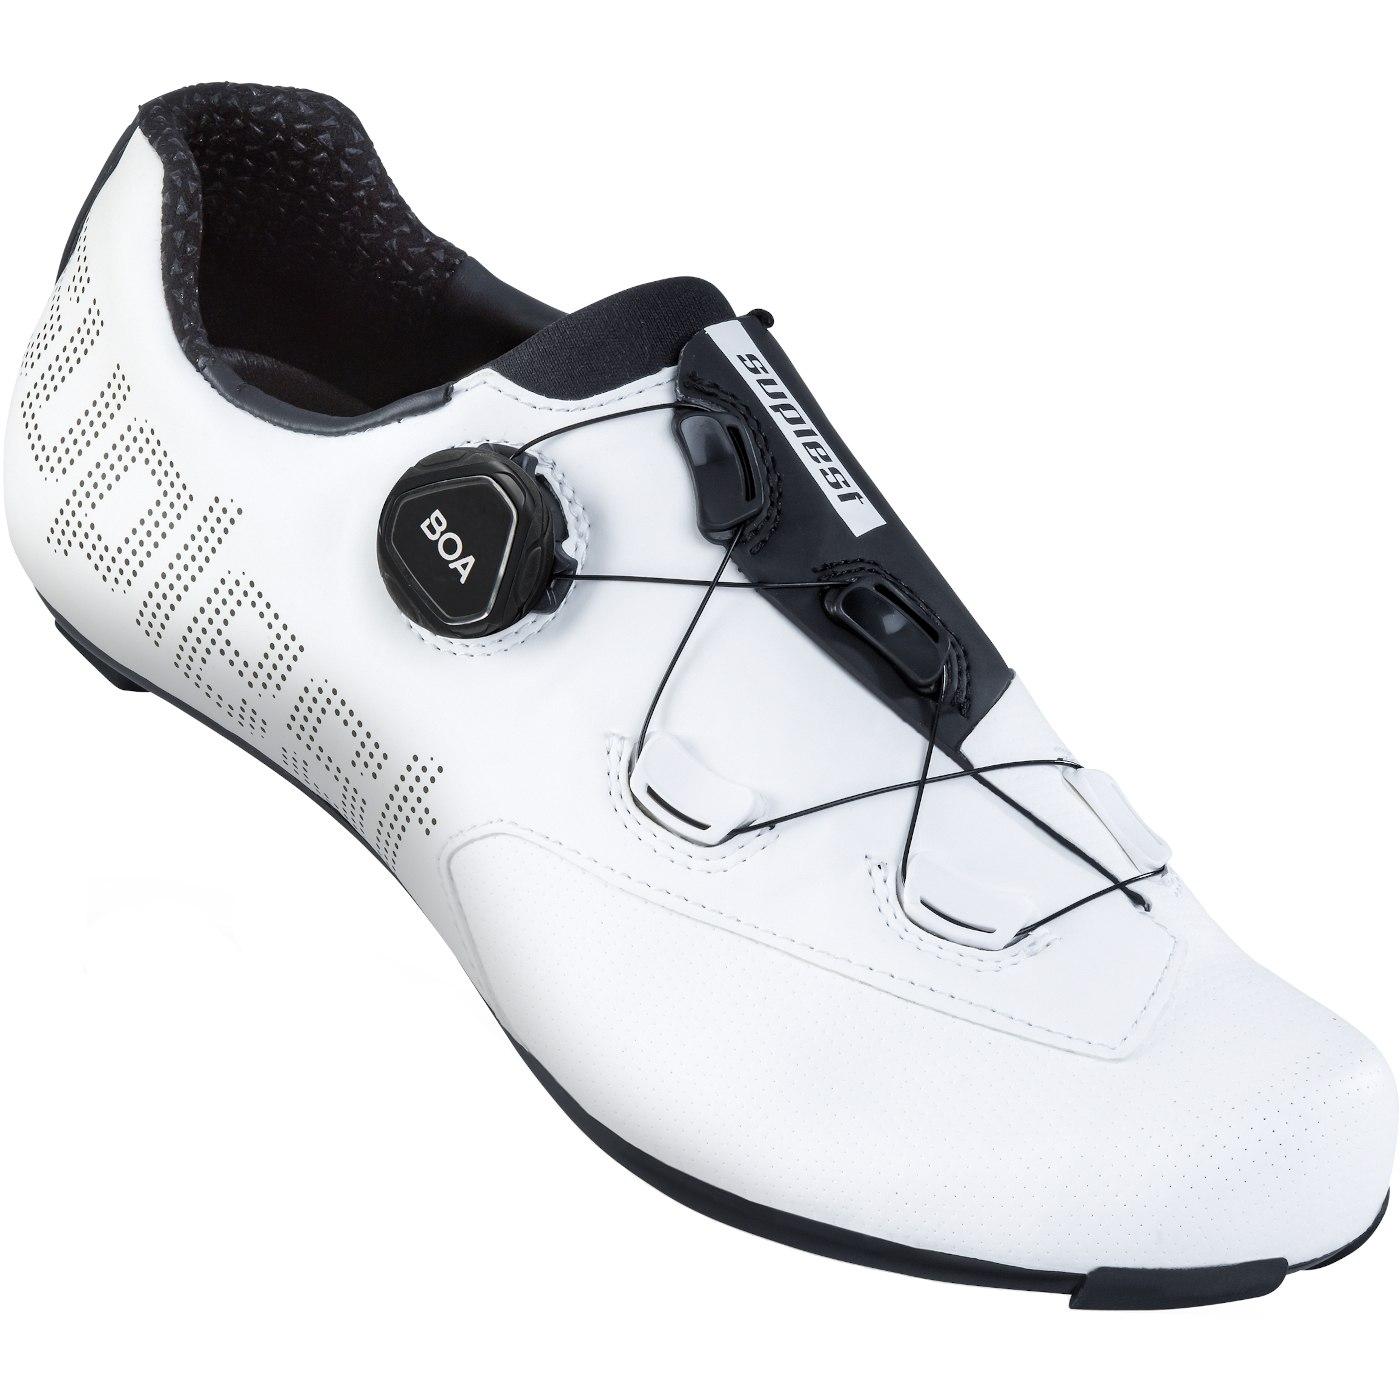 Image of Suplest EDGE+ BOA L6 Road Sport Road Shoe - White / Black 01.066.